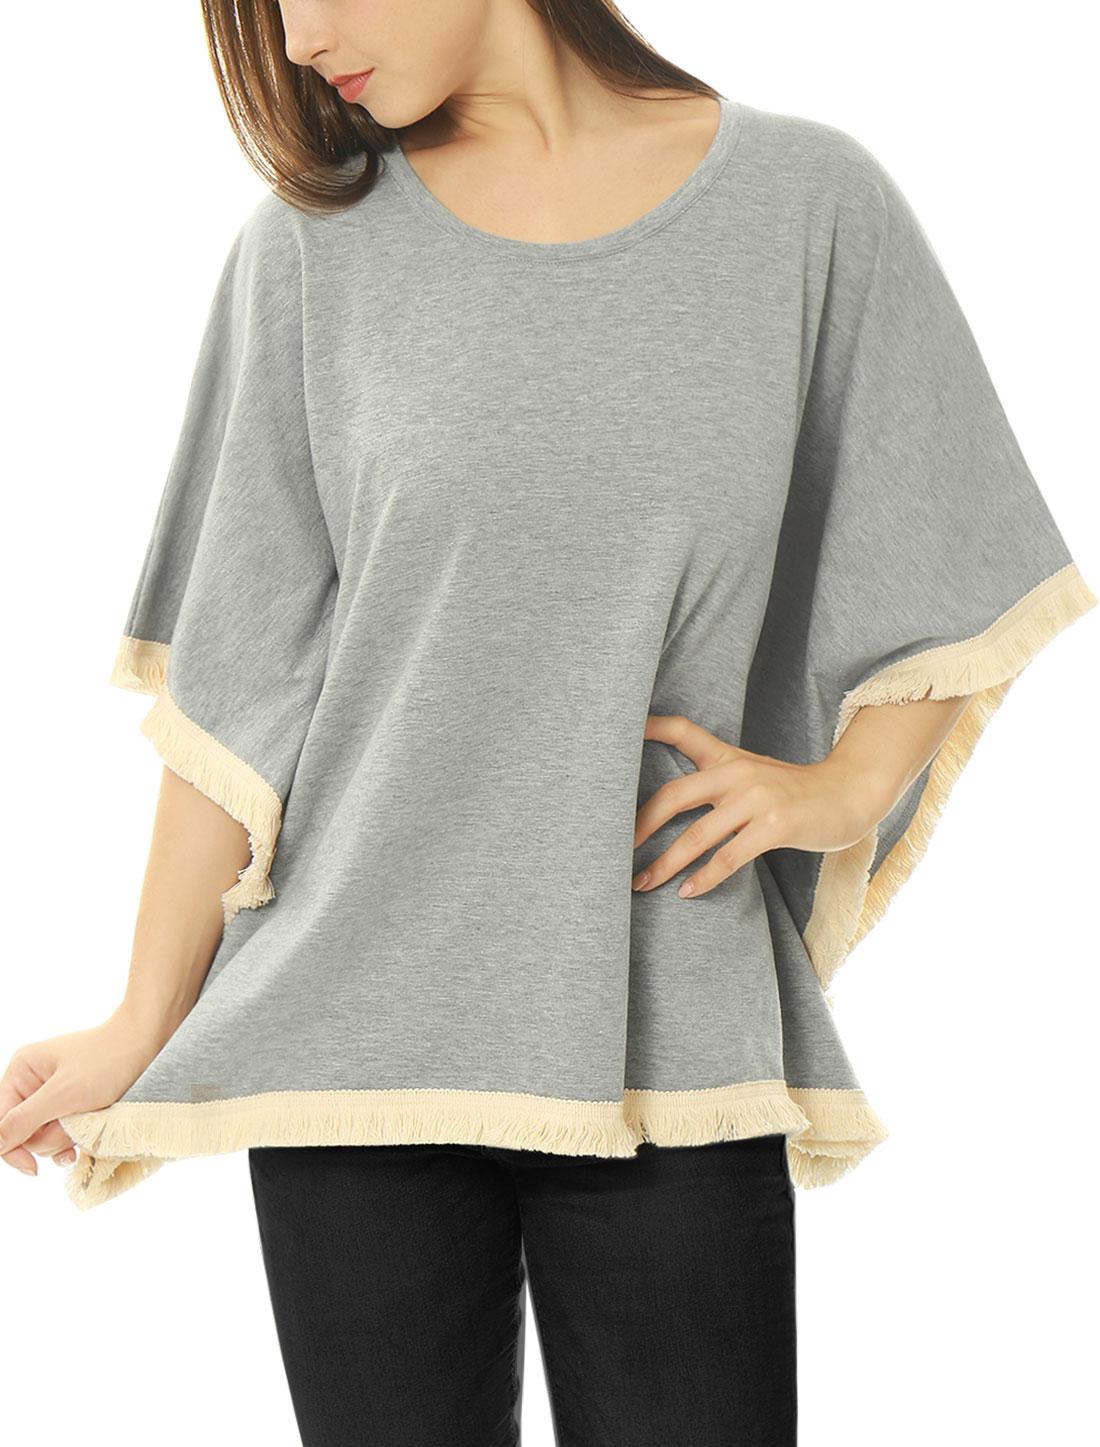 Women Batwing Sleeves Contrast Fringe Oversized Poncho Gray XL